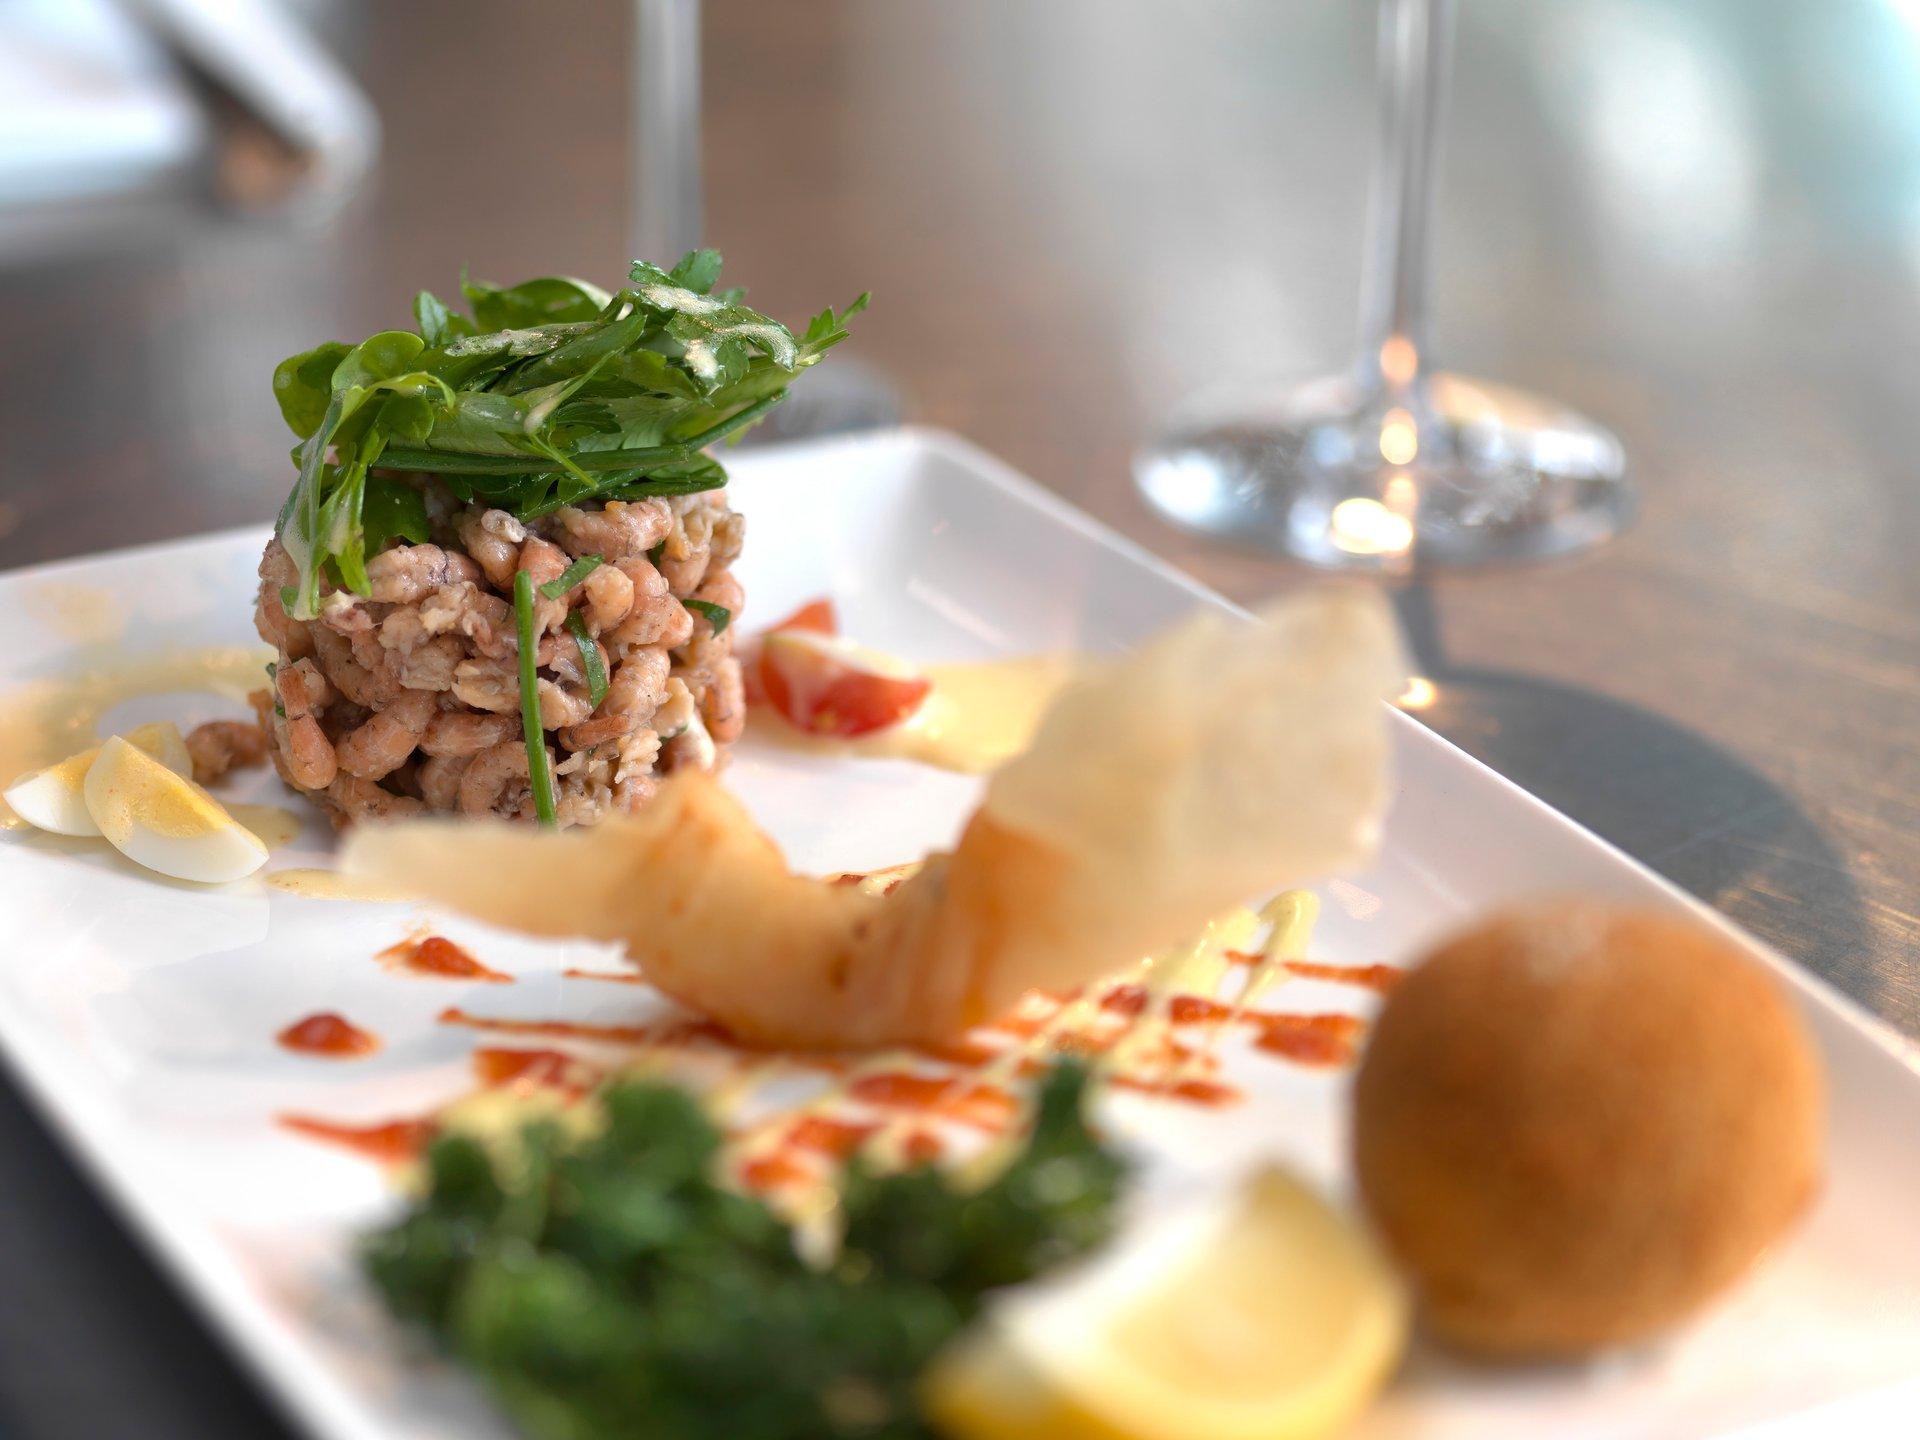 Shrimp Season in Belgium 2020 - Best Time